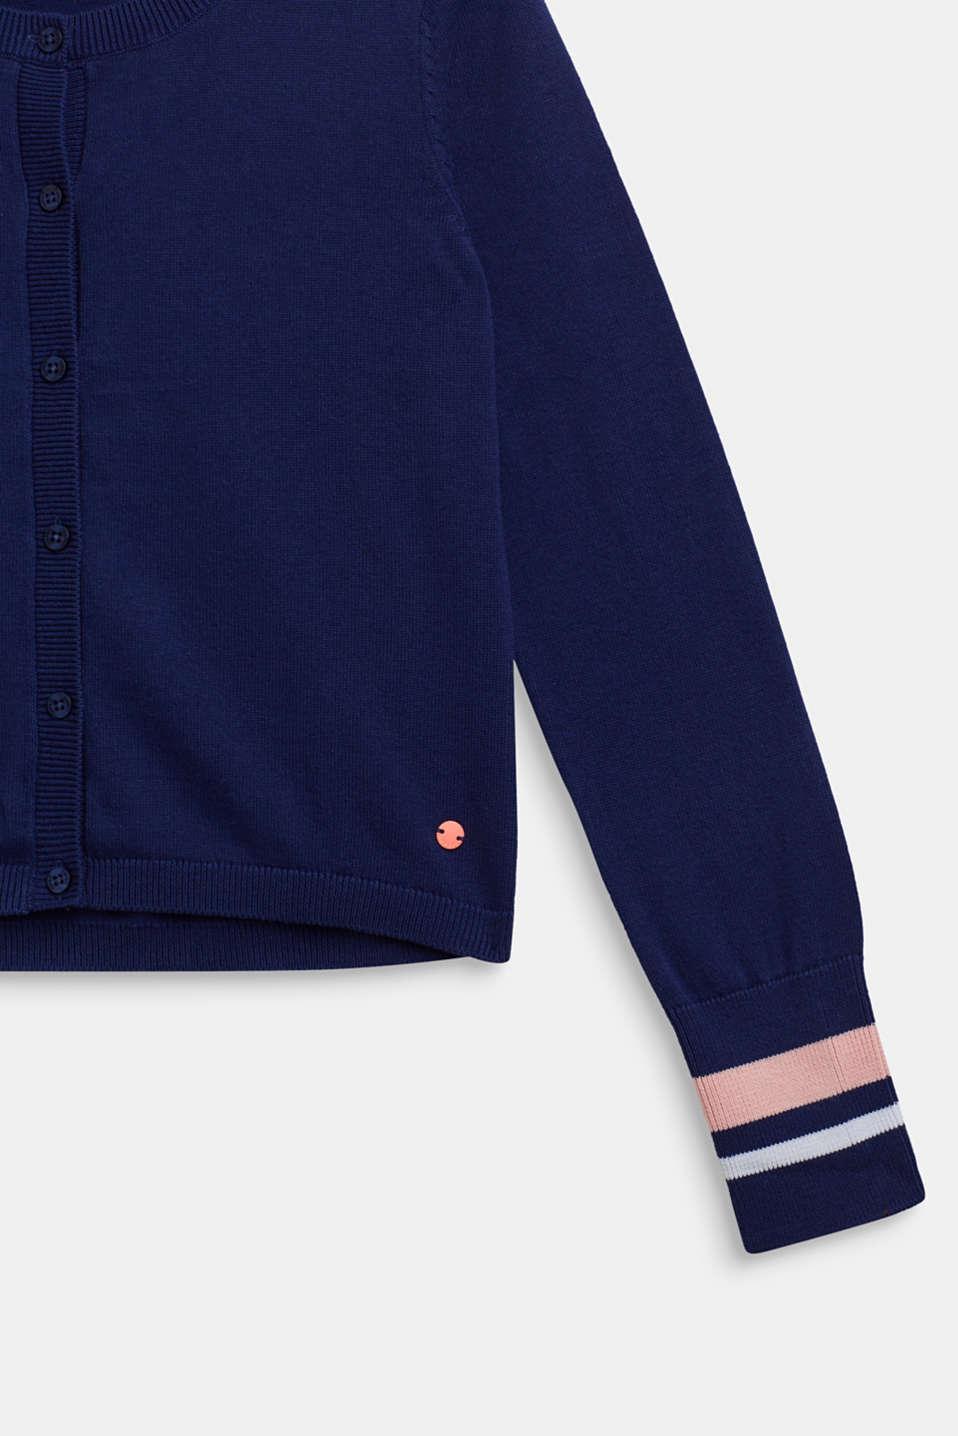 Striped cardigan, 100% cotton, LCMARINE BLUE, detail image number 2